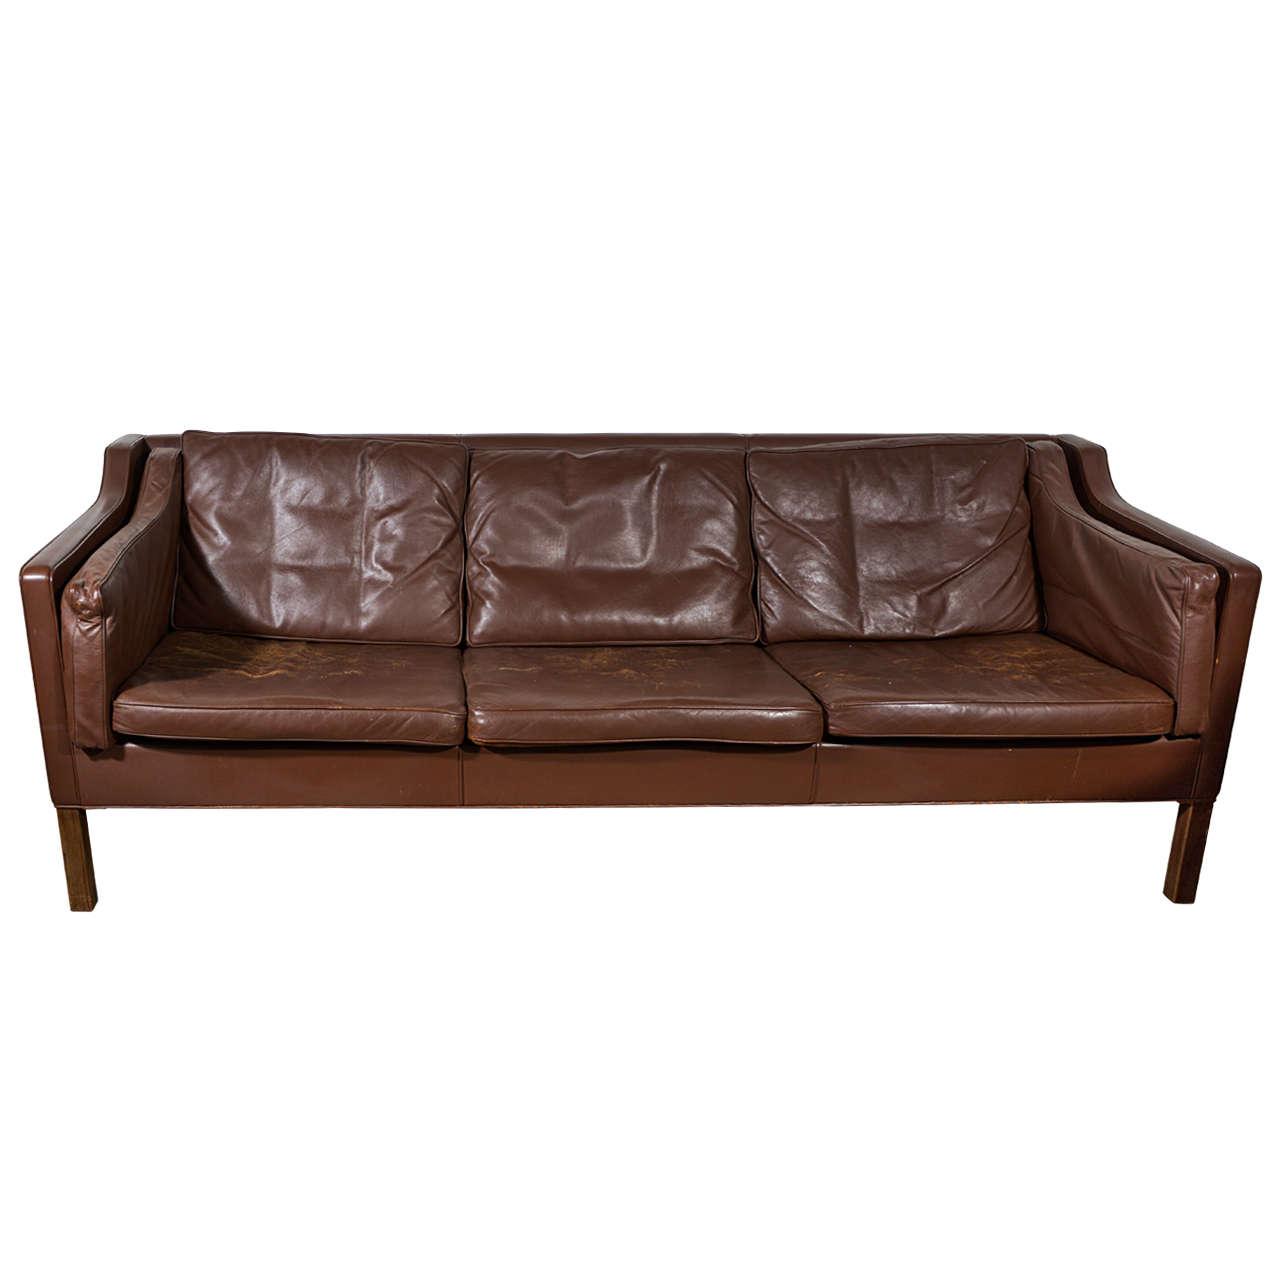 Mogensen Dark Chocolate Vintage Leather Sofa at 1stdibs